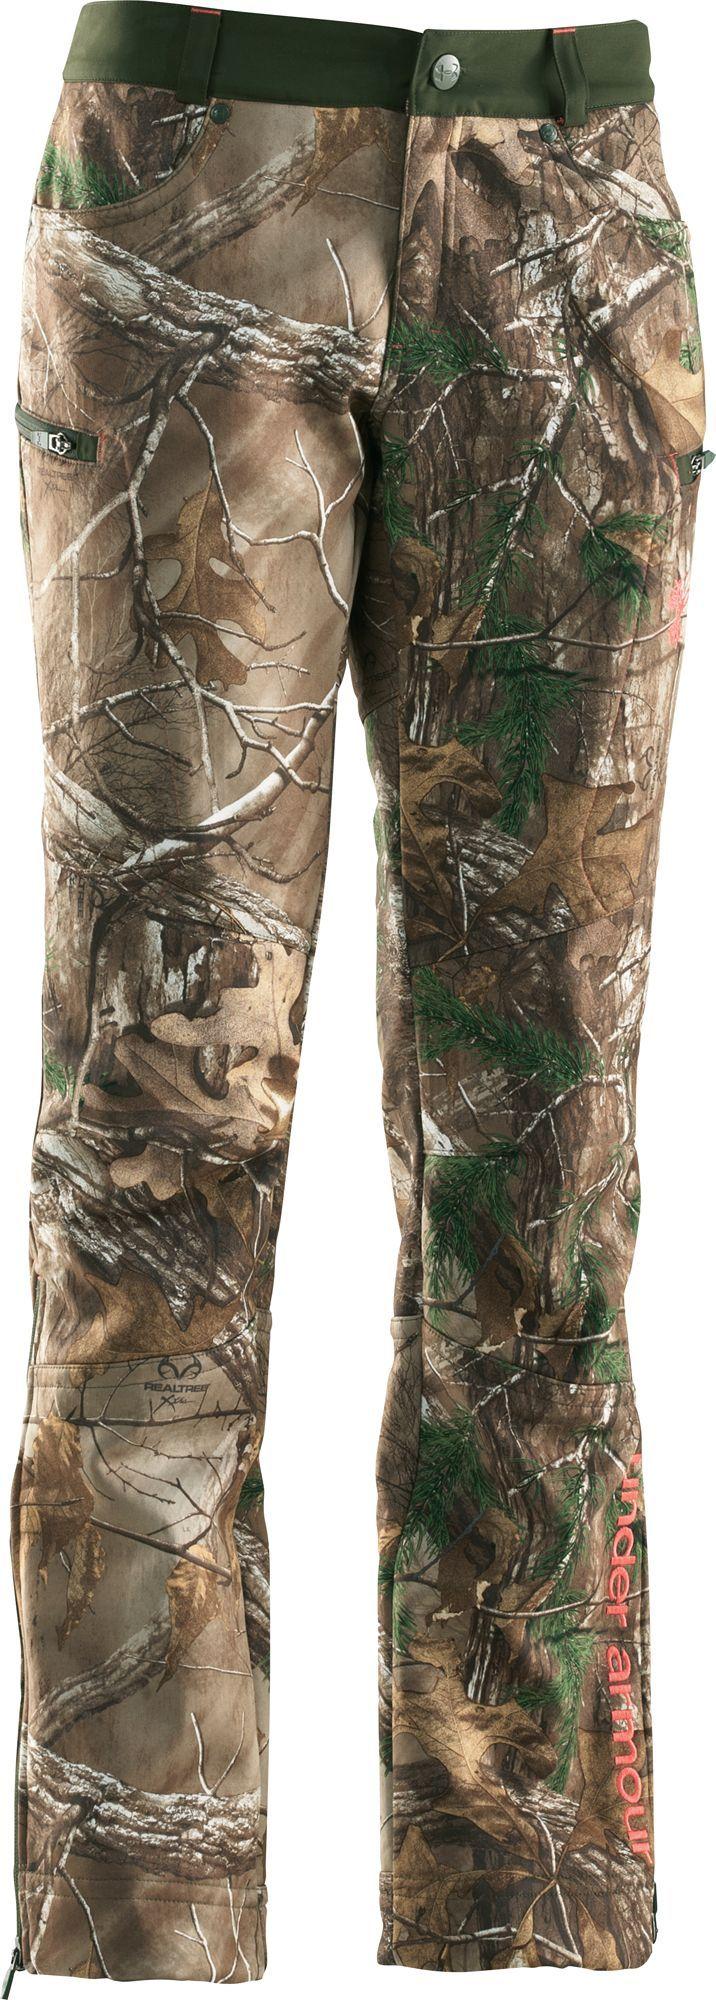 Under Armour® Women's CGI Ridge Reaper® Pants : Cabela's